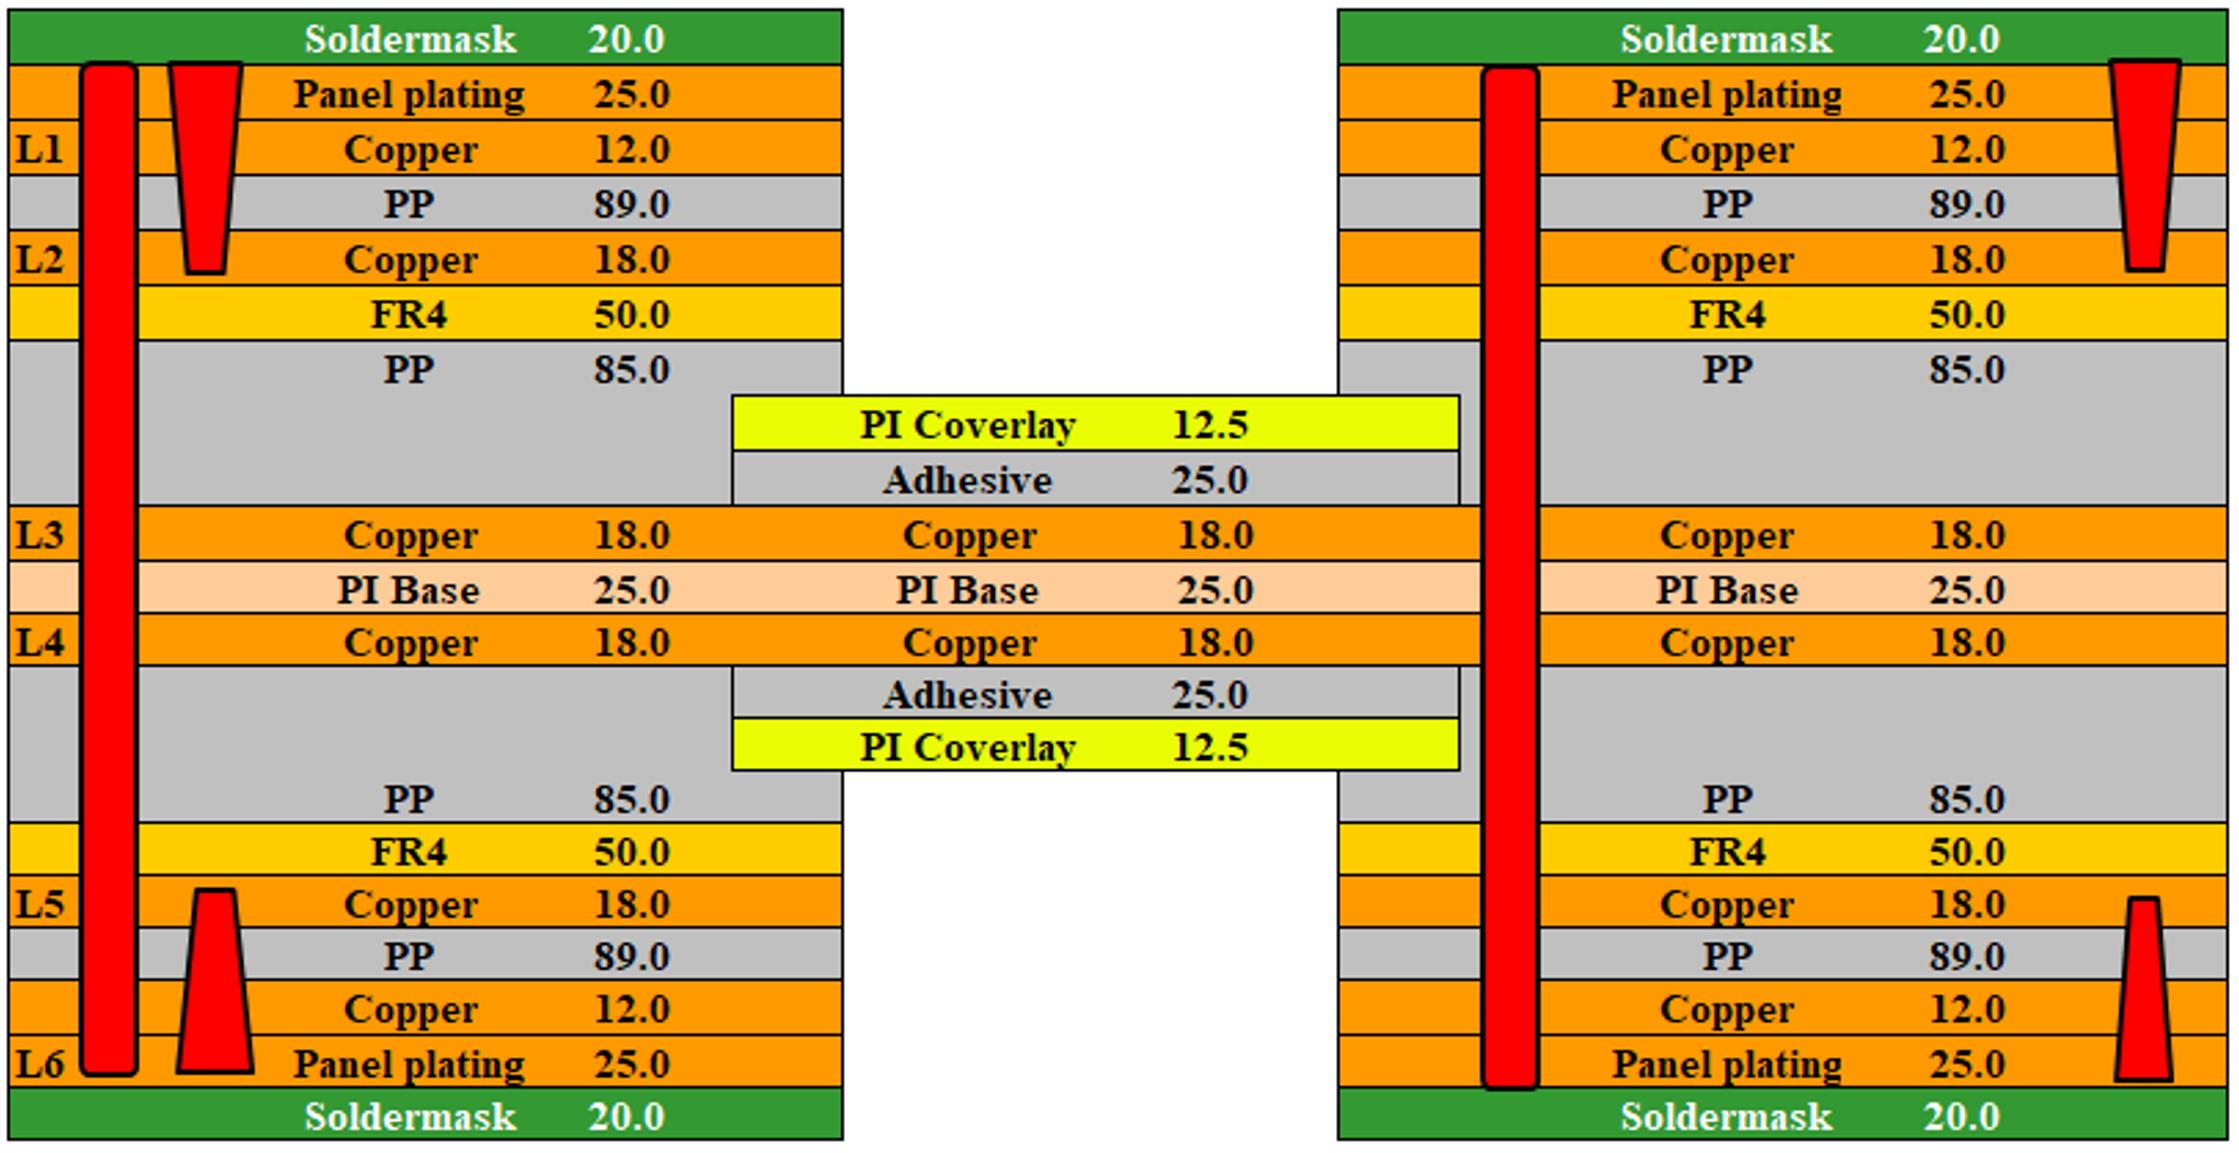 18 Lamination structure rigid flex PCB - 6L ENIG Rigid-Flex Board